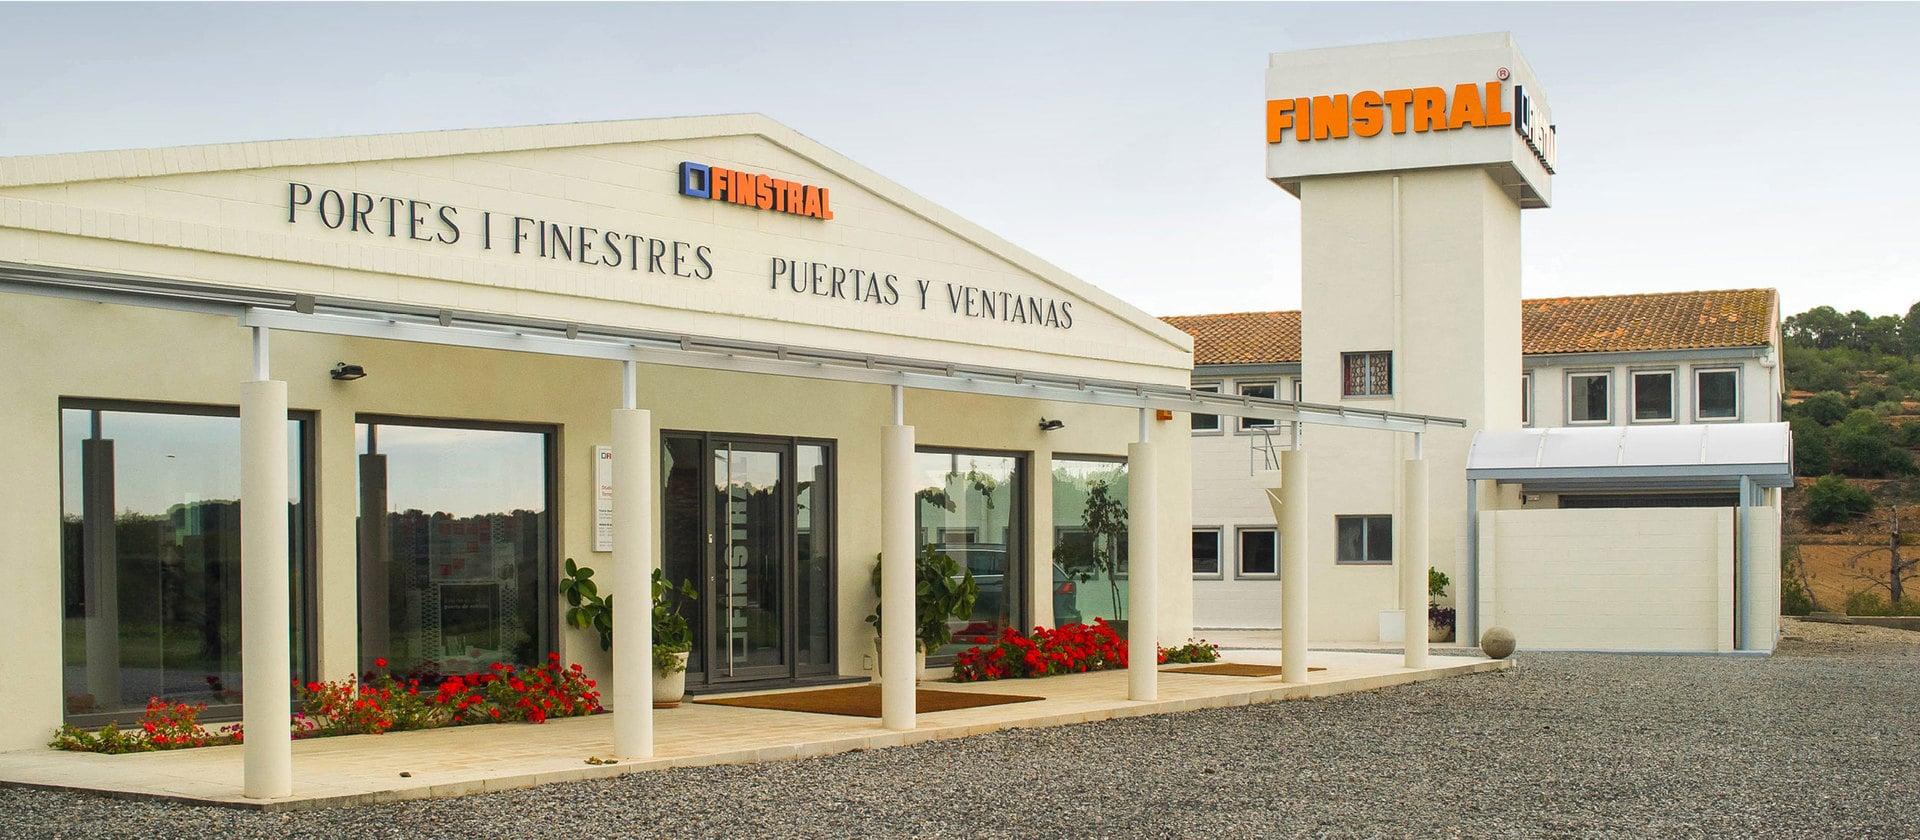 Finstral Studio Tarragona